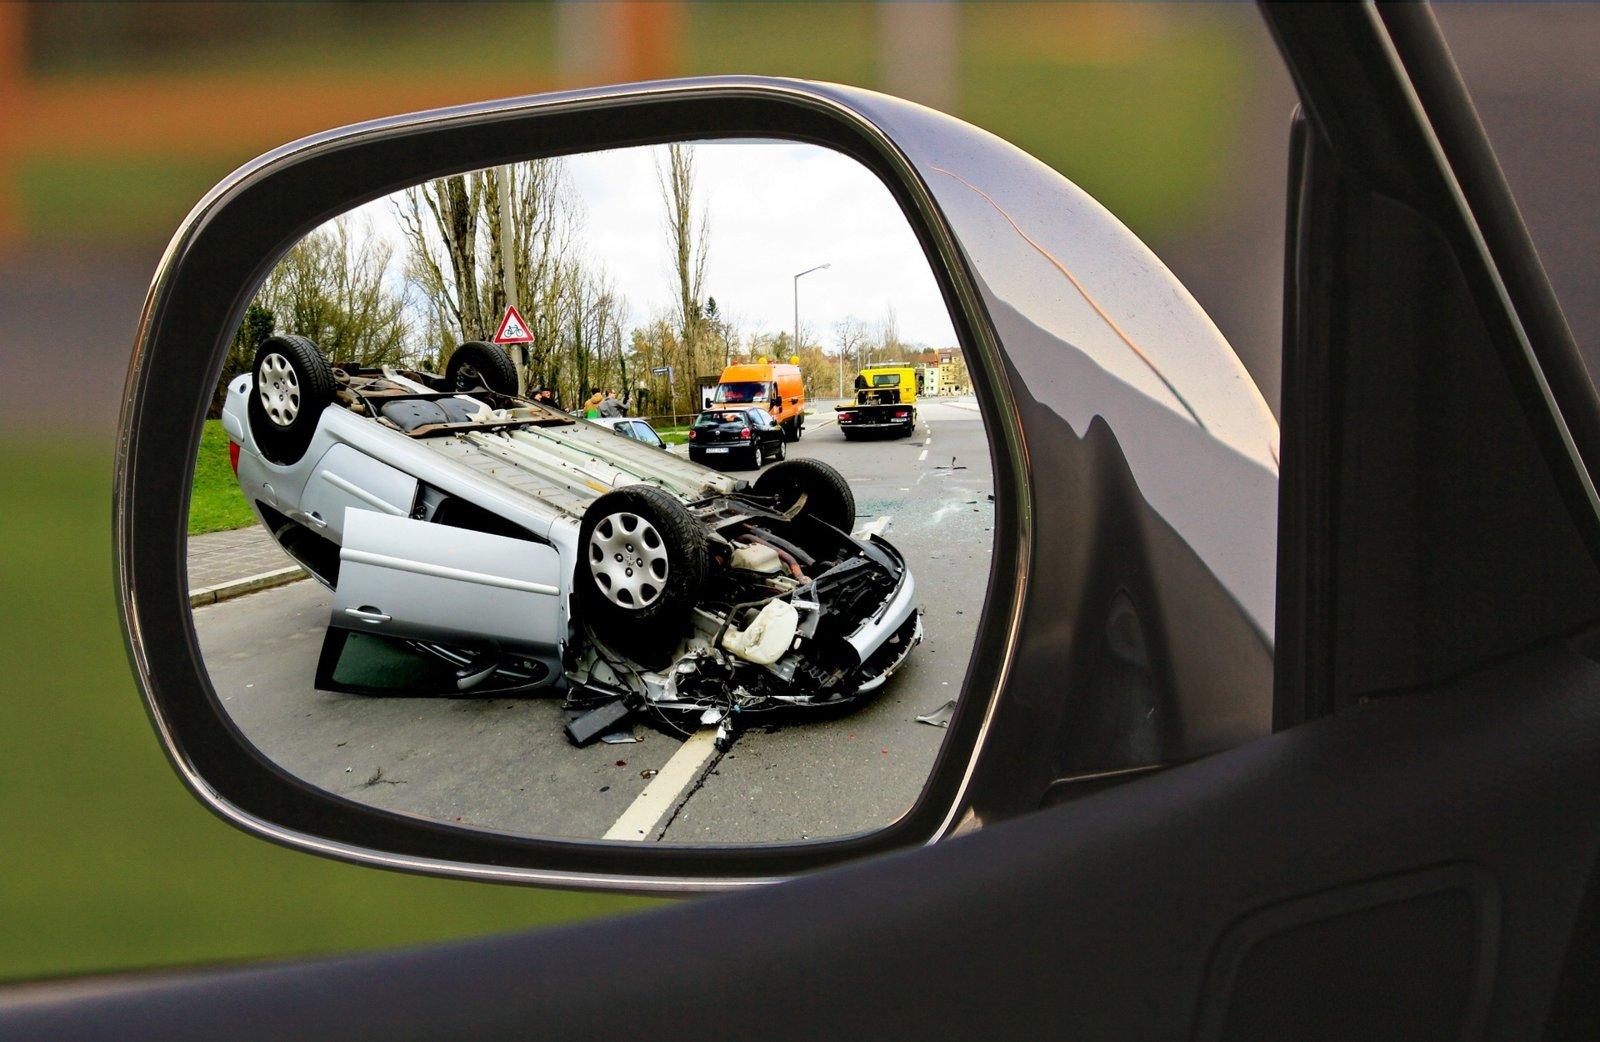 accident-1497295_1920-jpg.4160